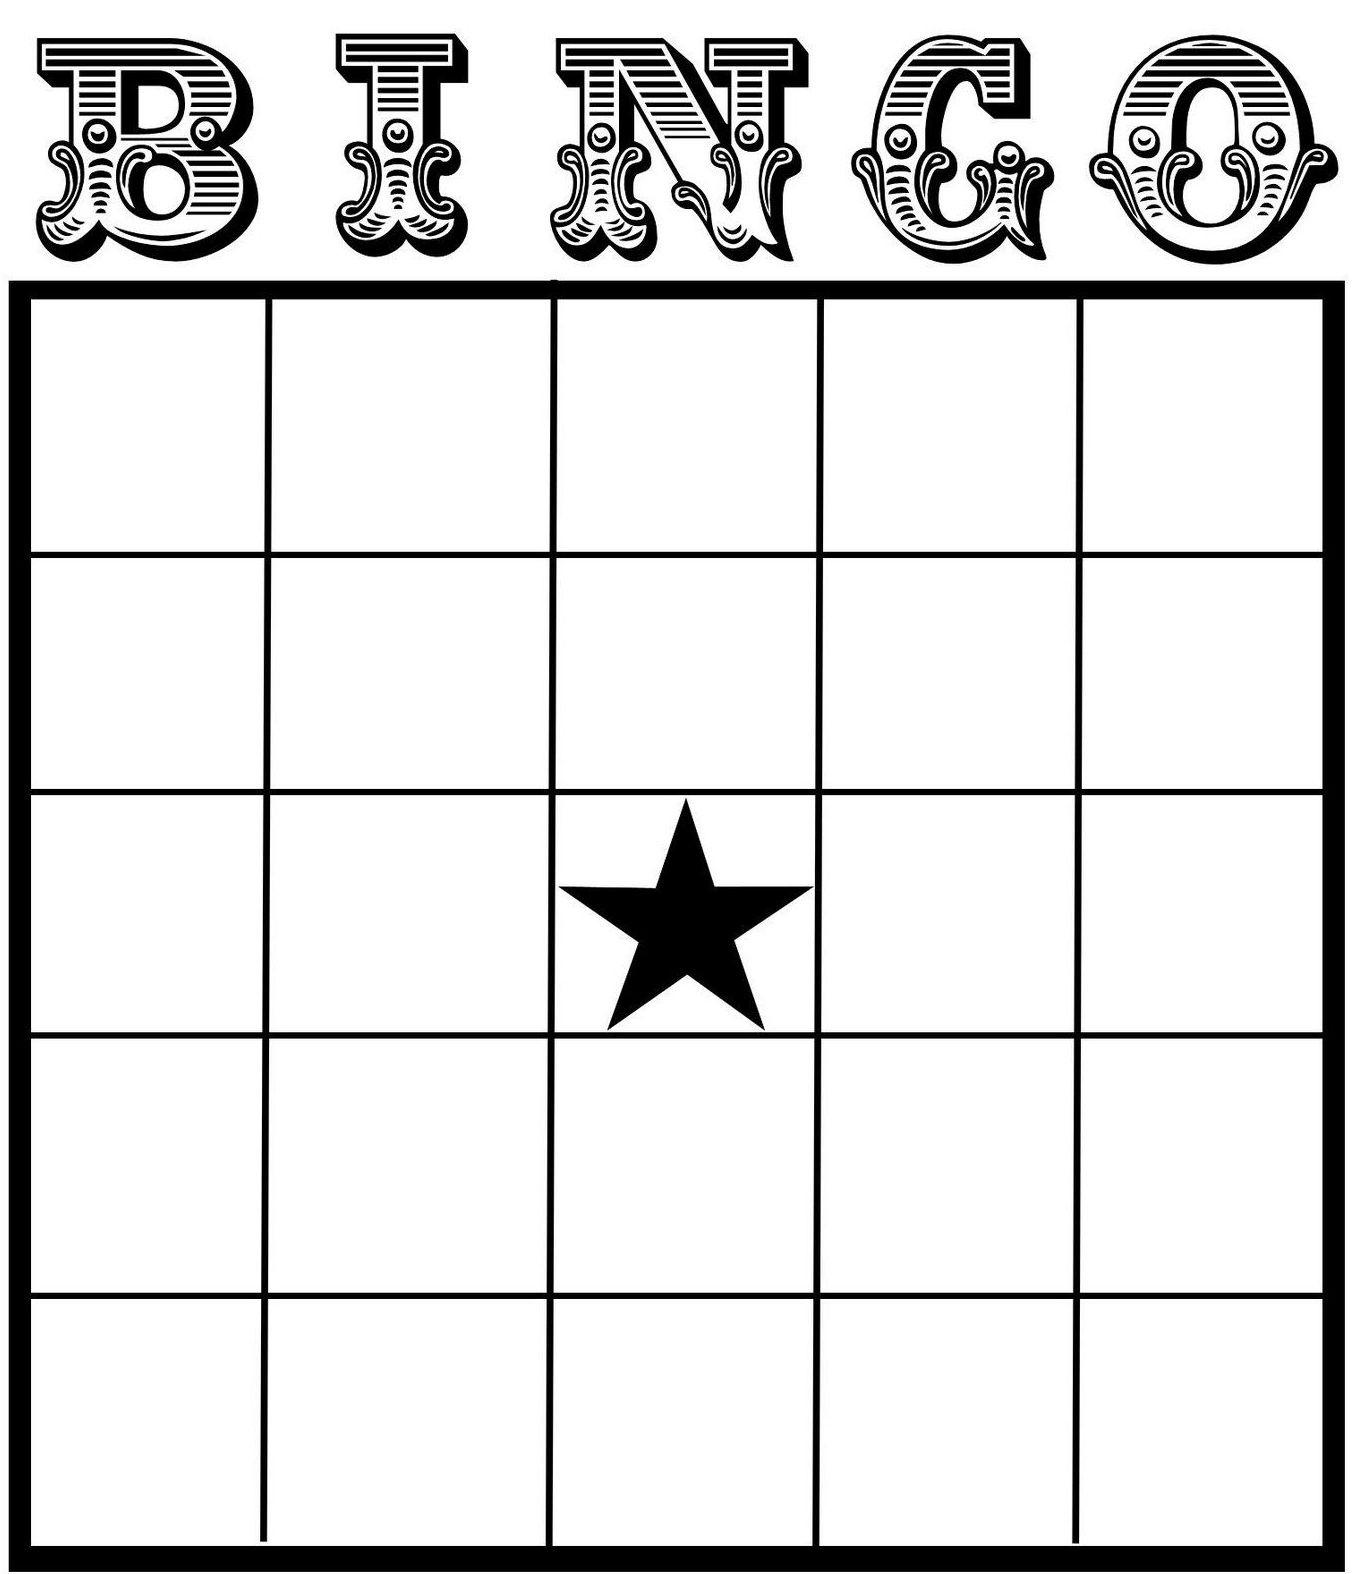 002 Blank Bingo Card Template Ideas Stupendous Free Generator Using - Free Printable Bingo Cards For Teachers